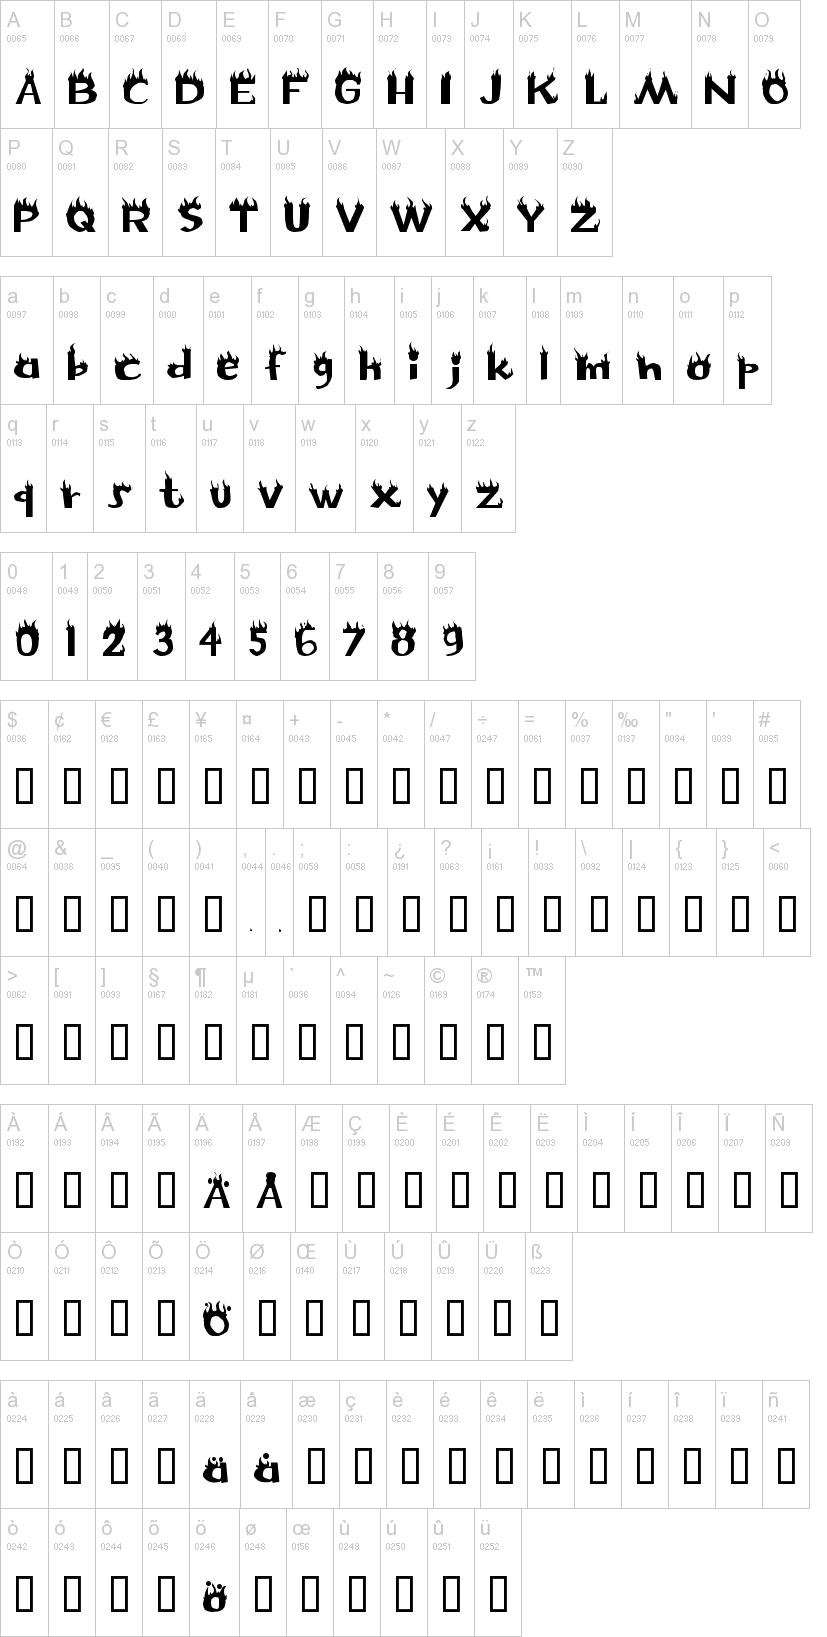 Flame Font | dafont com